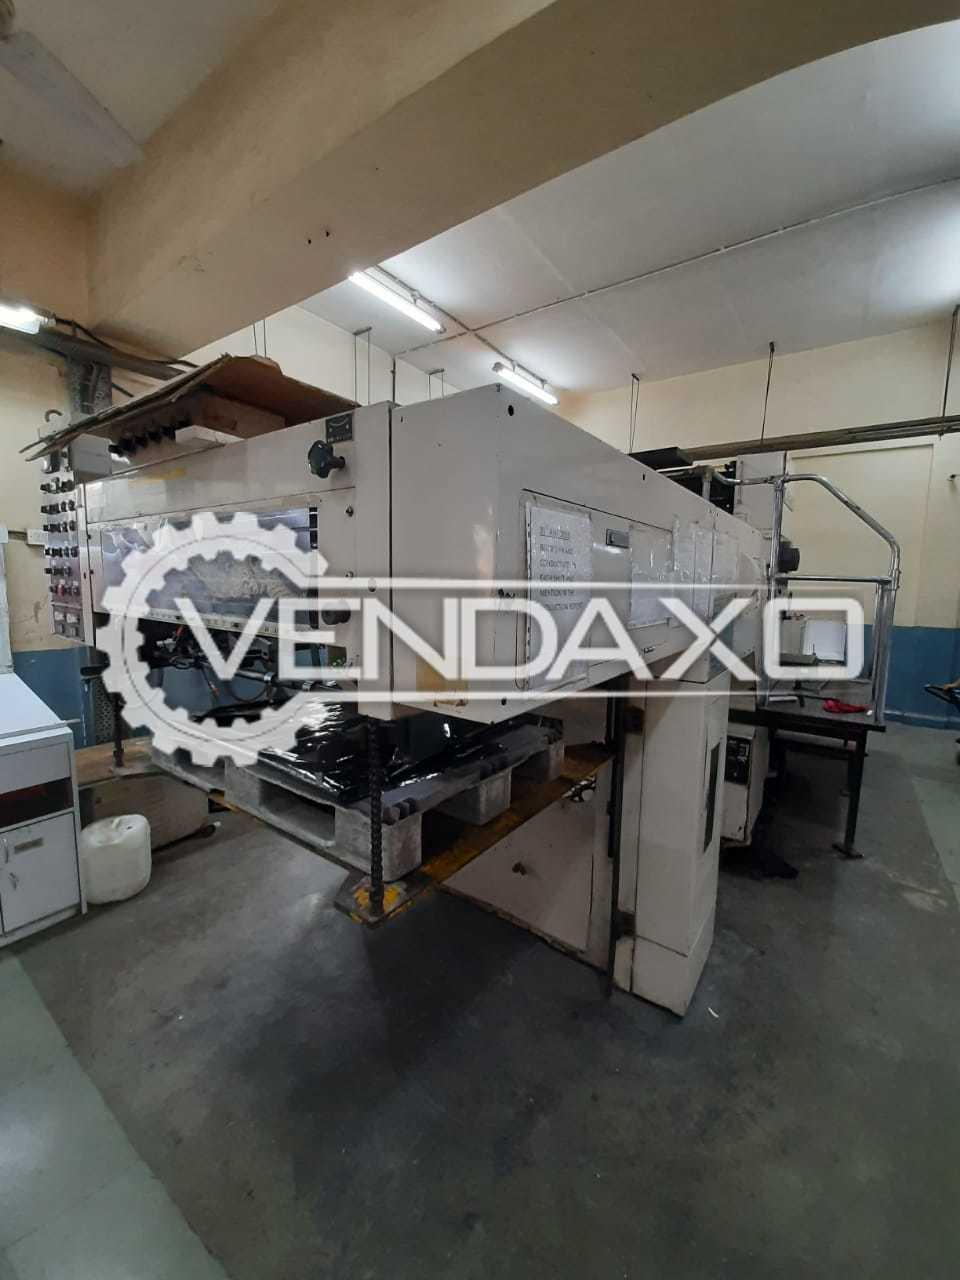 2 Set of Mitsubishi III 3DP Offset Printing Machine - 28 x 40 Inch, 2 Color